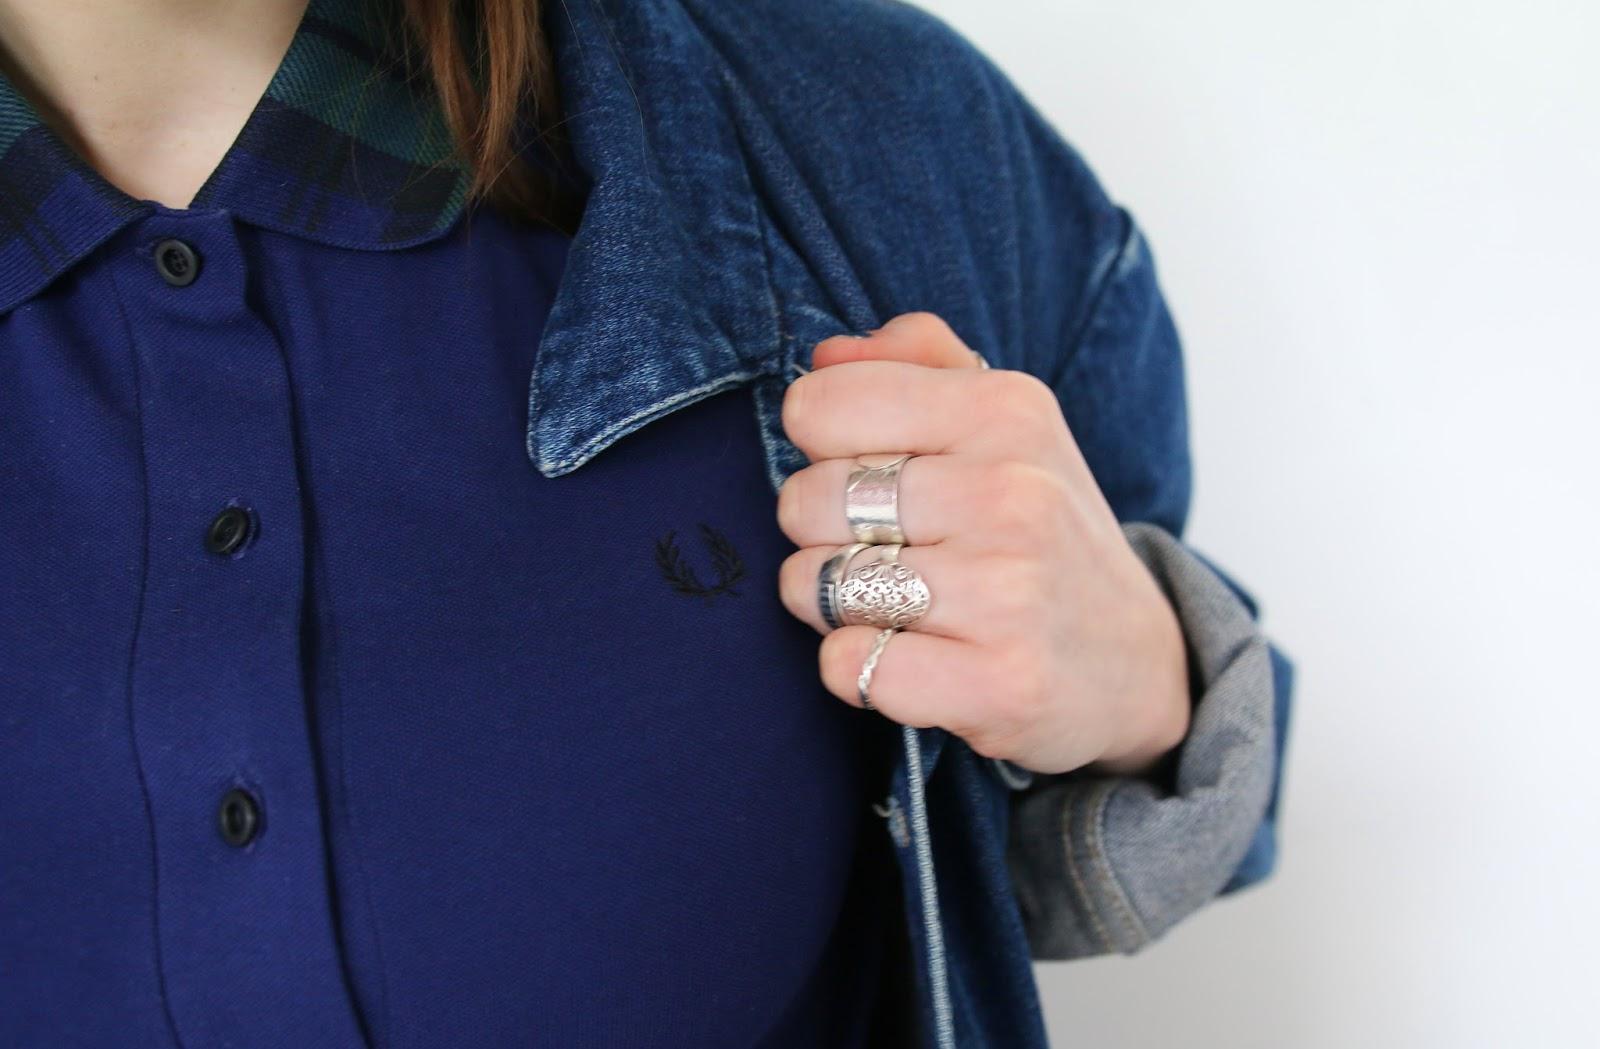 fred perry, woman, navy, tartan, green, collar, silver rings, fashion blogger, denim,